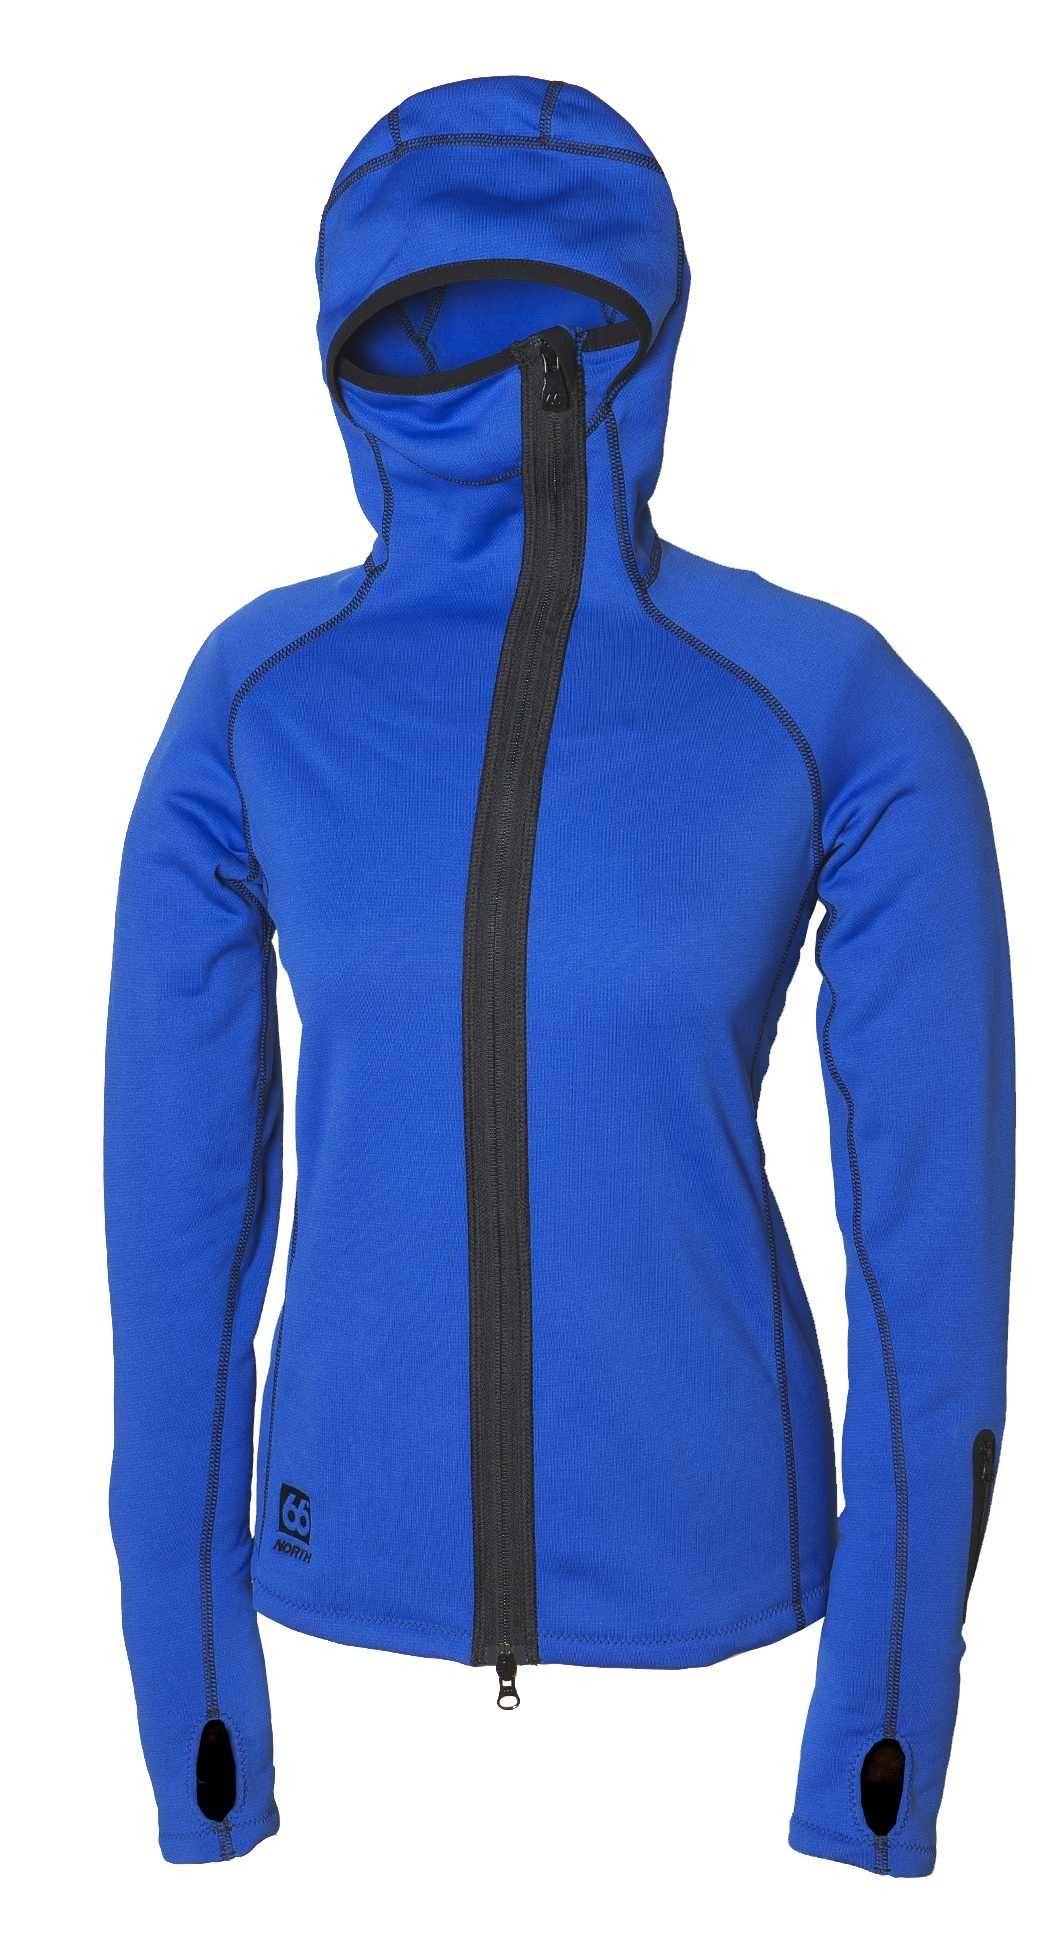 66North Vik Wind pro jacket blue